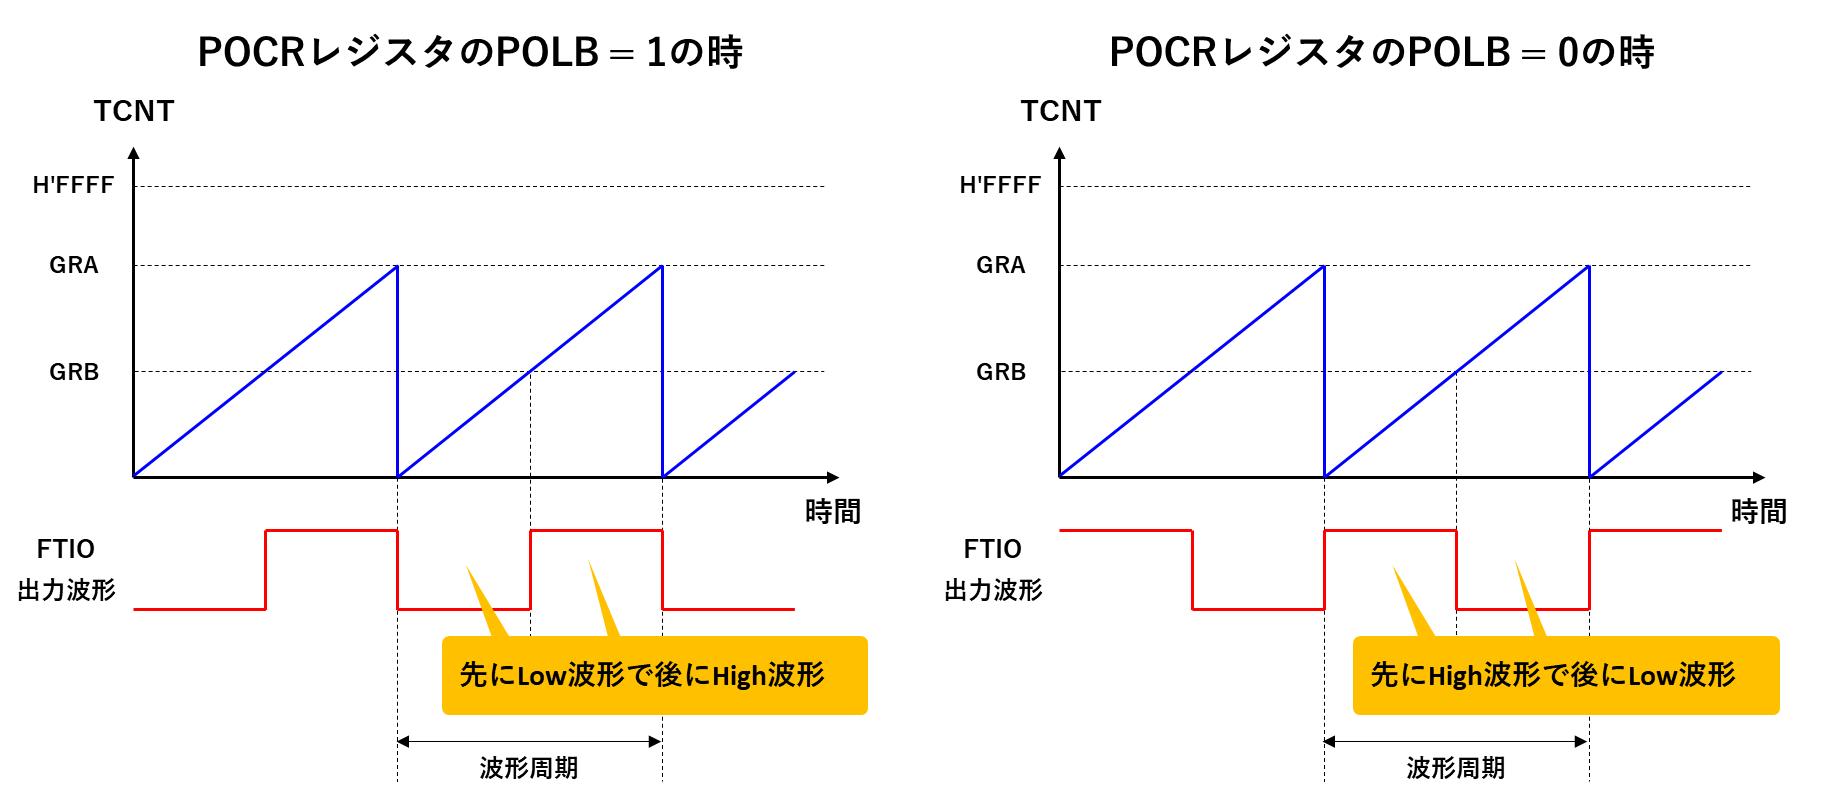 POCRの設定値による波形の変化